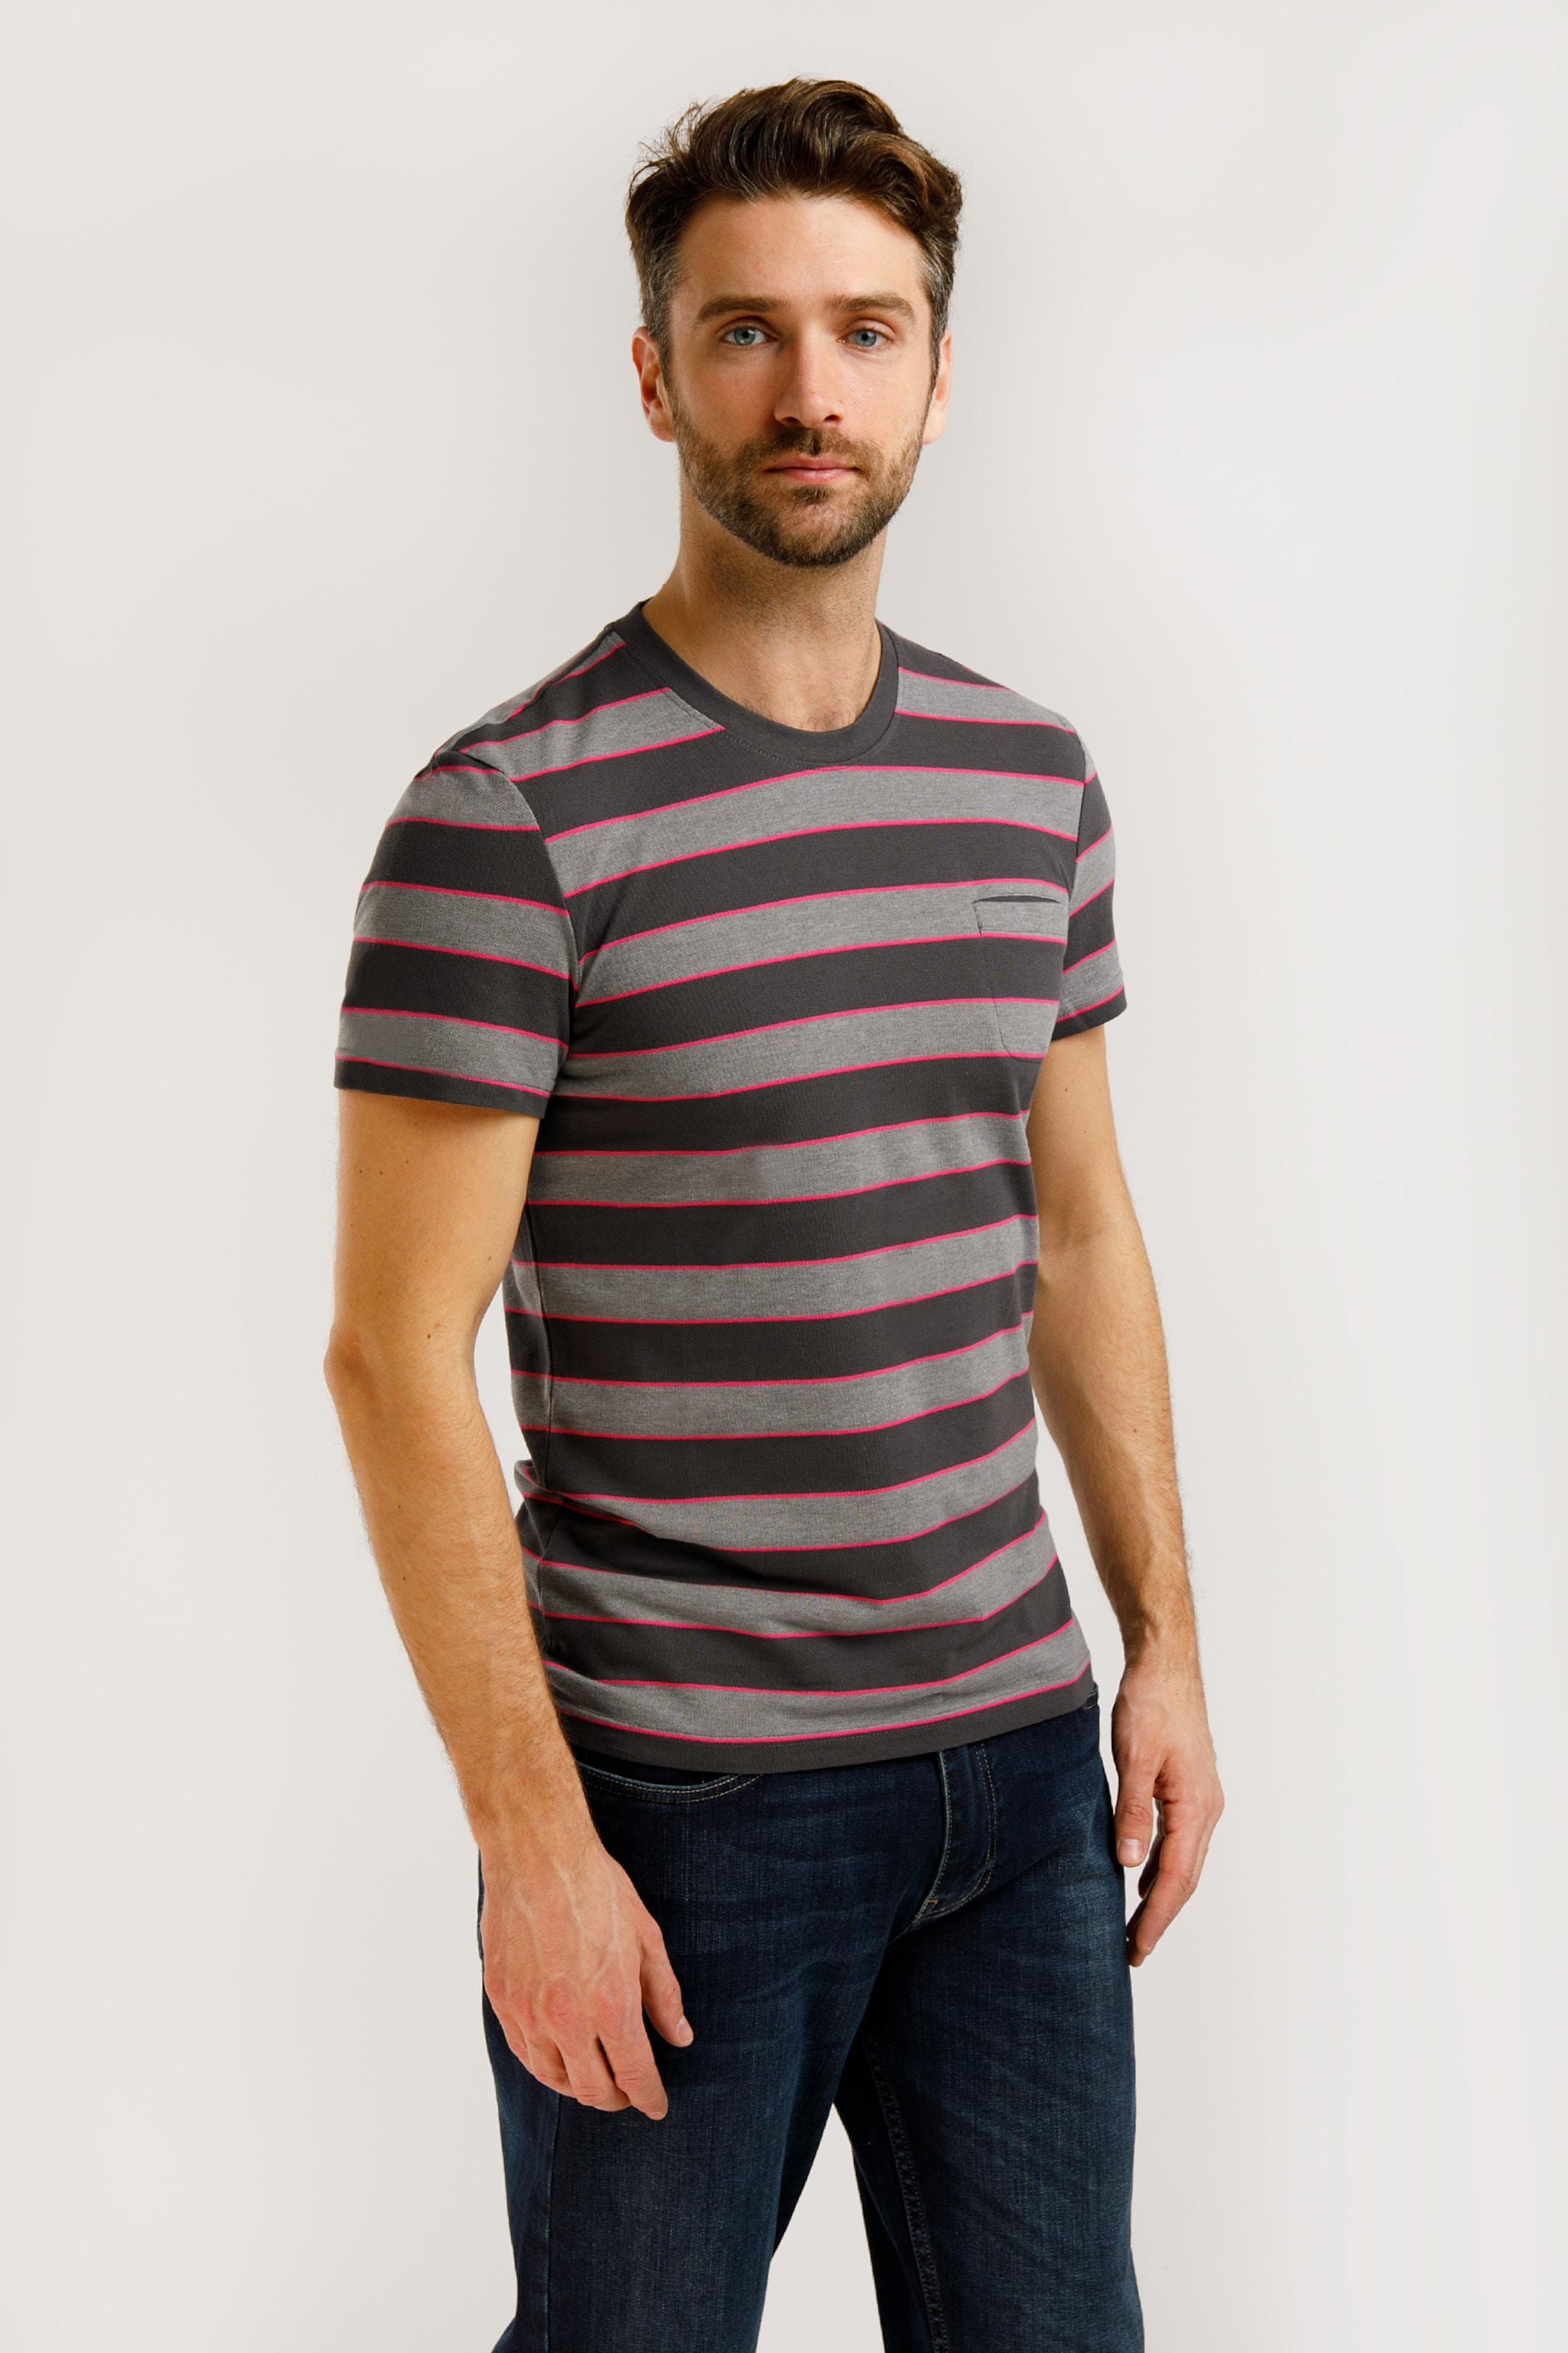 Finn Flare T-Shirt in basaltgrau / magenta / schwarz Jersey 3118584